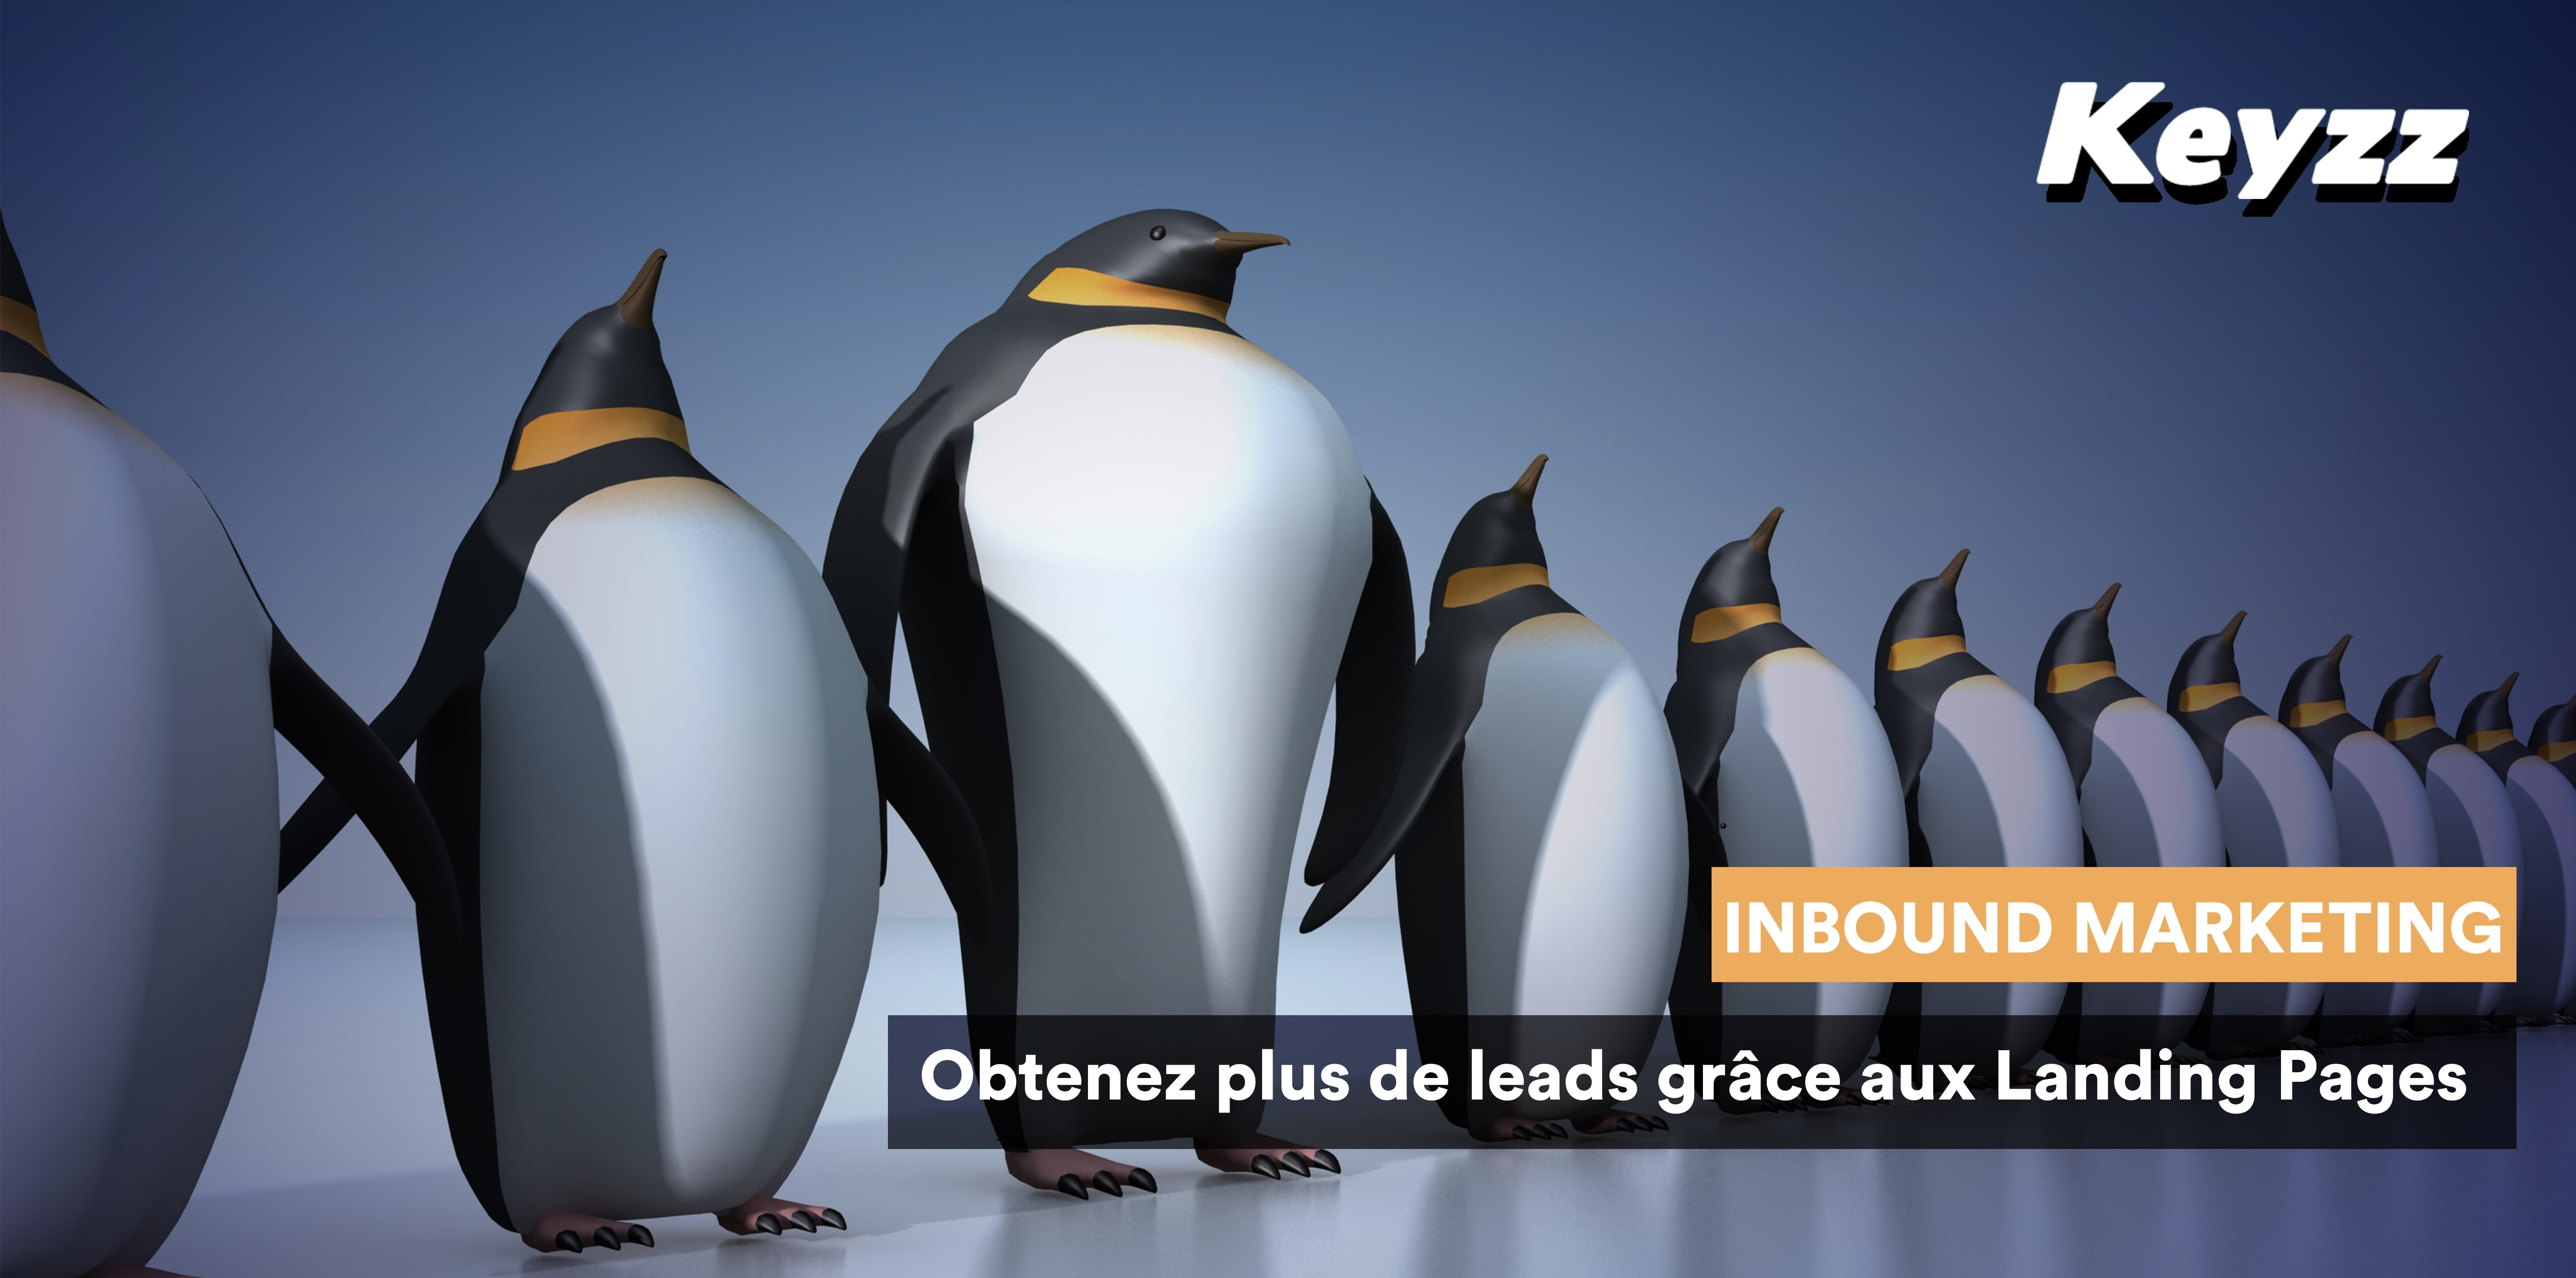 inboud marketing leads landing page pingouin